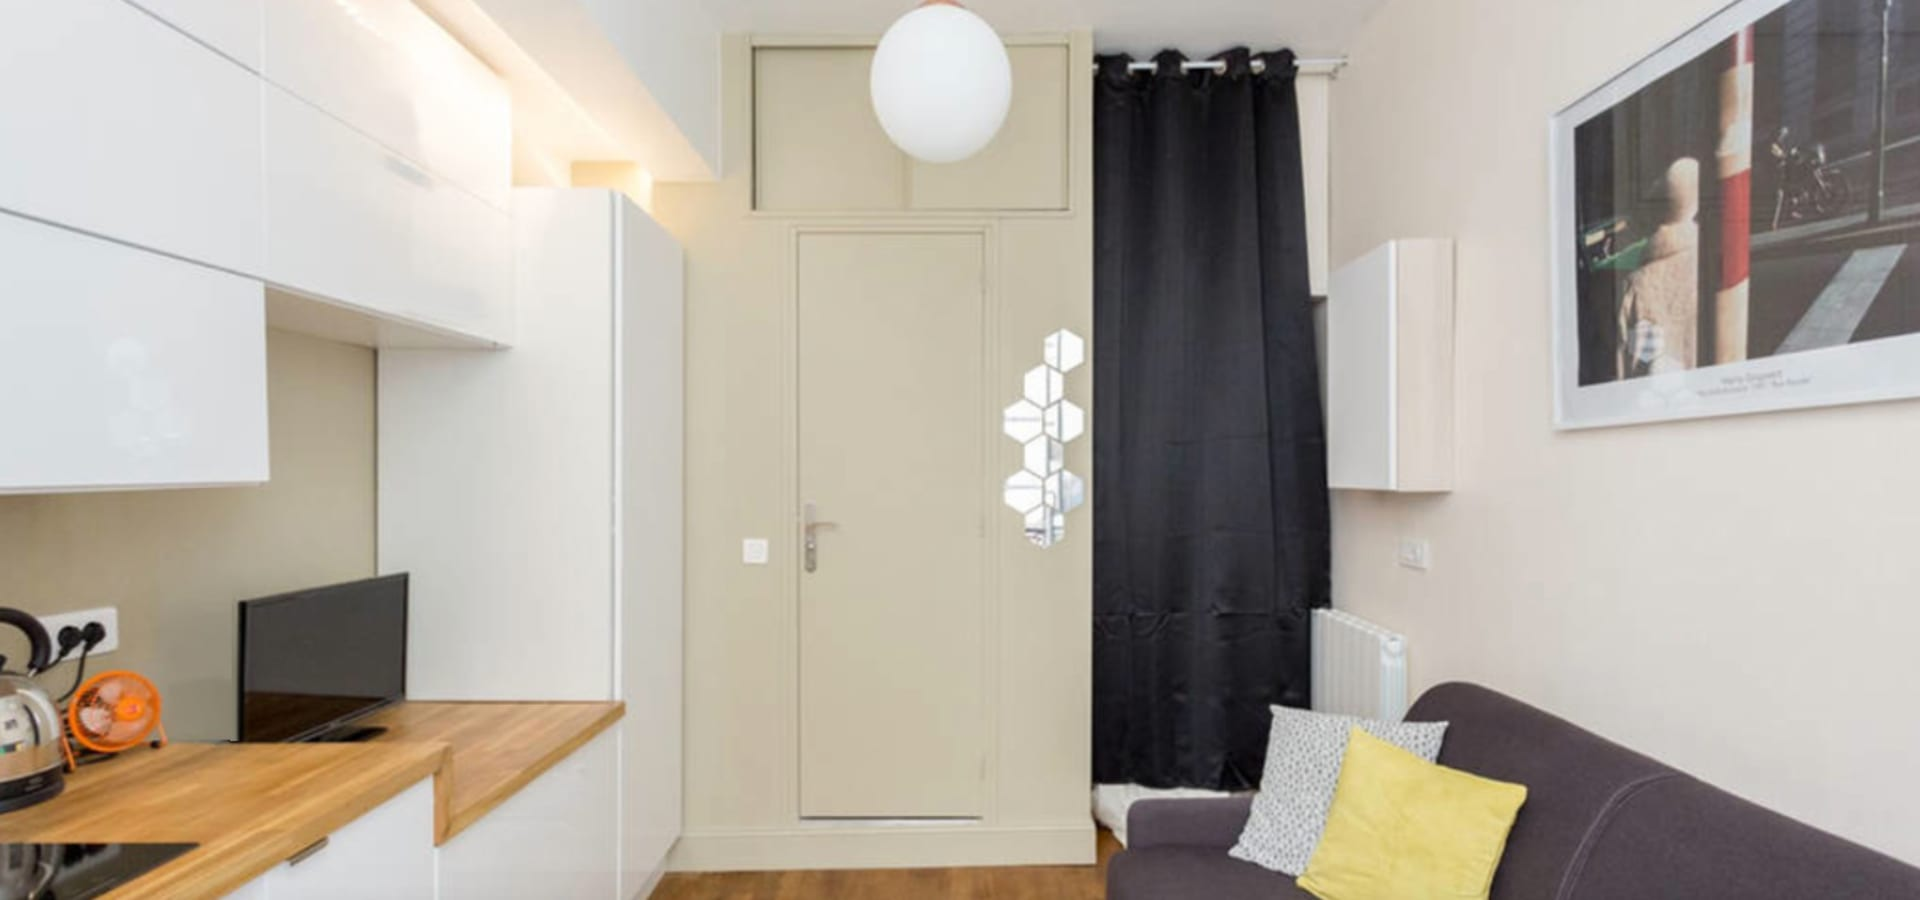 architecte d intrieur petite surface awesome dcoration. Black Bedroom Furniture Sets. Home Design Ideas